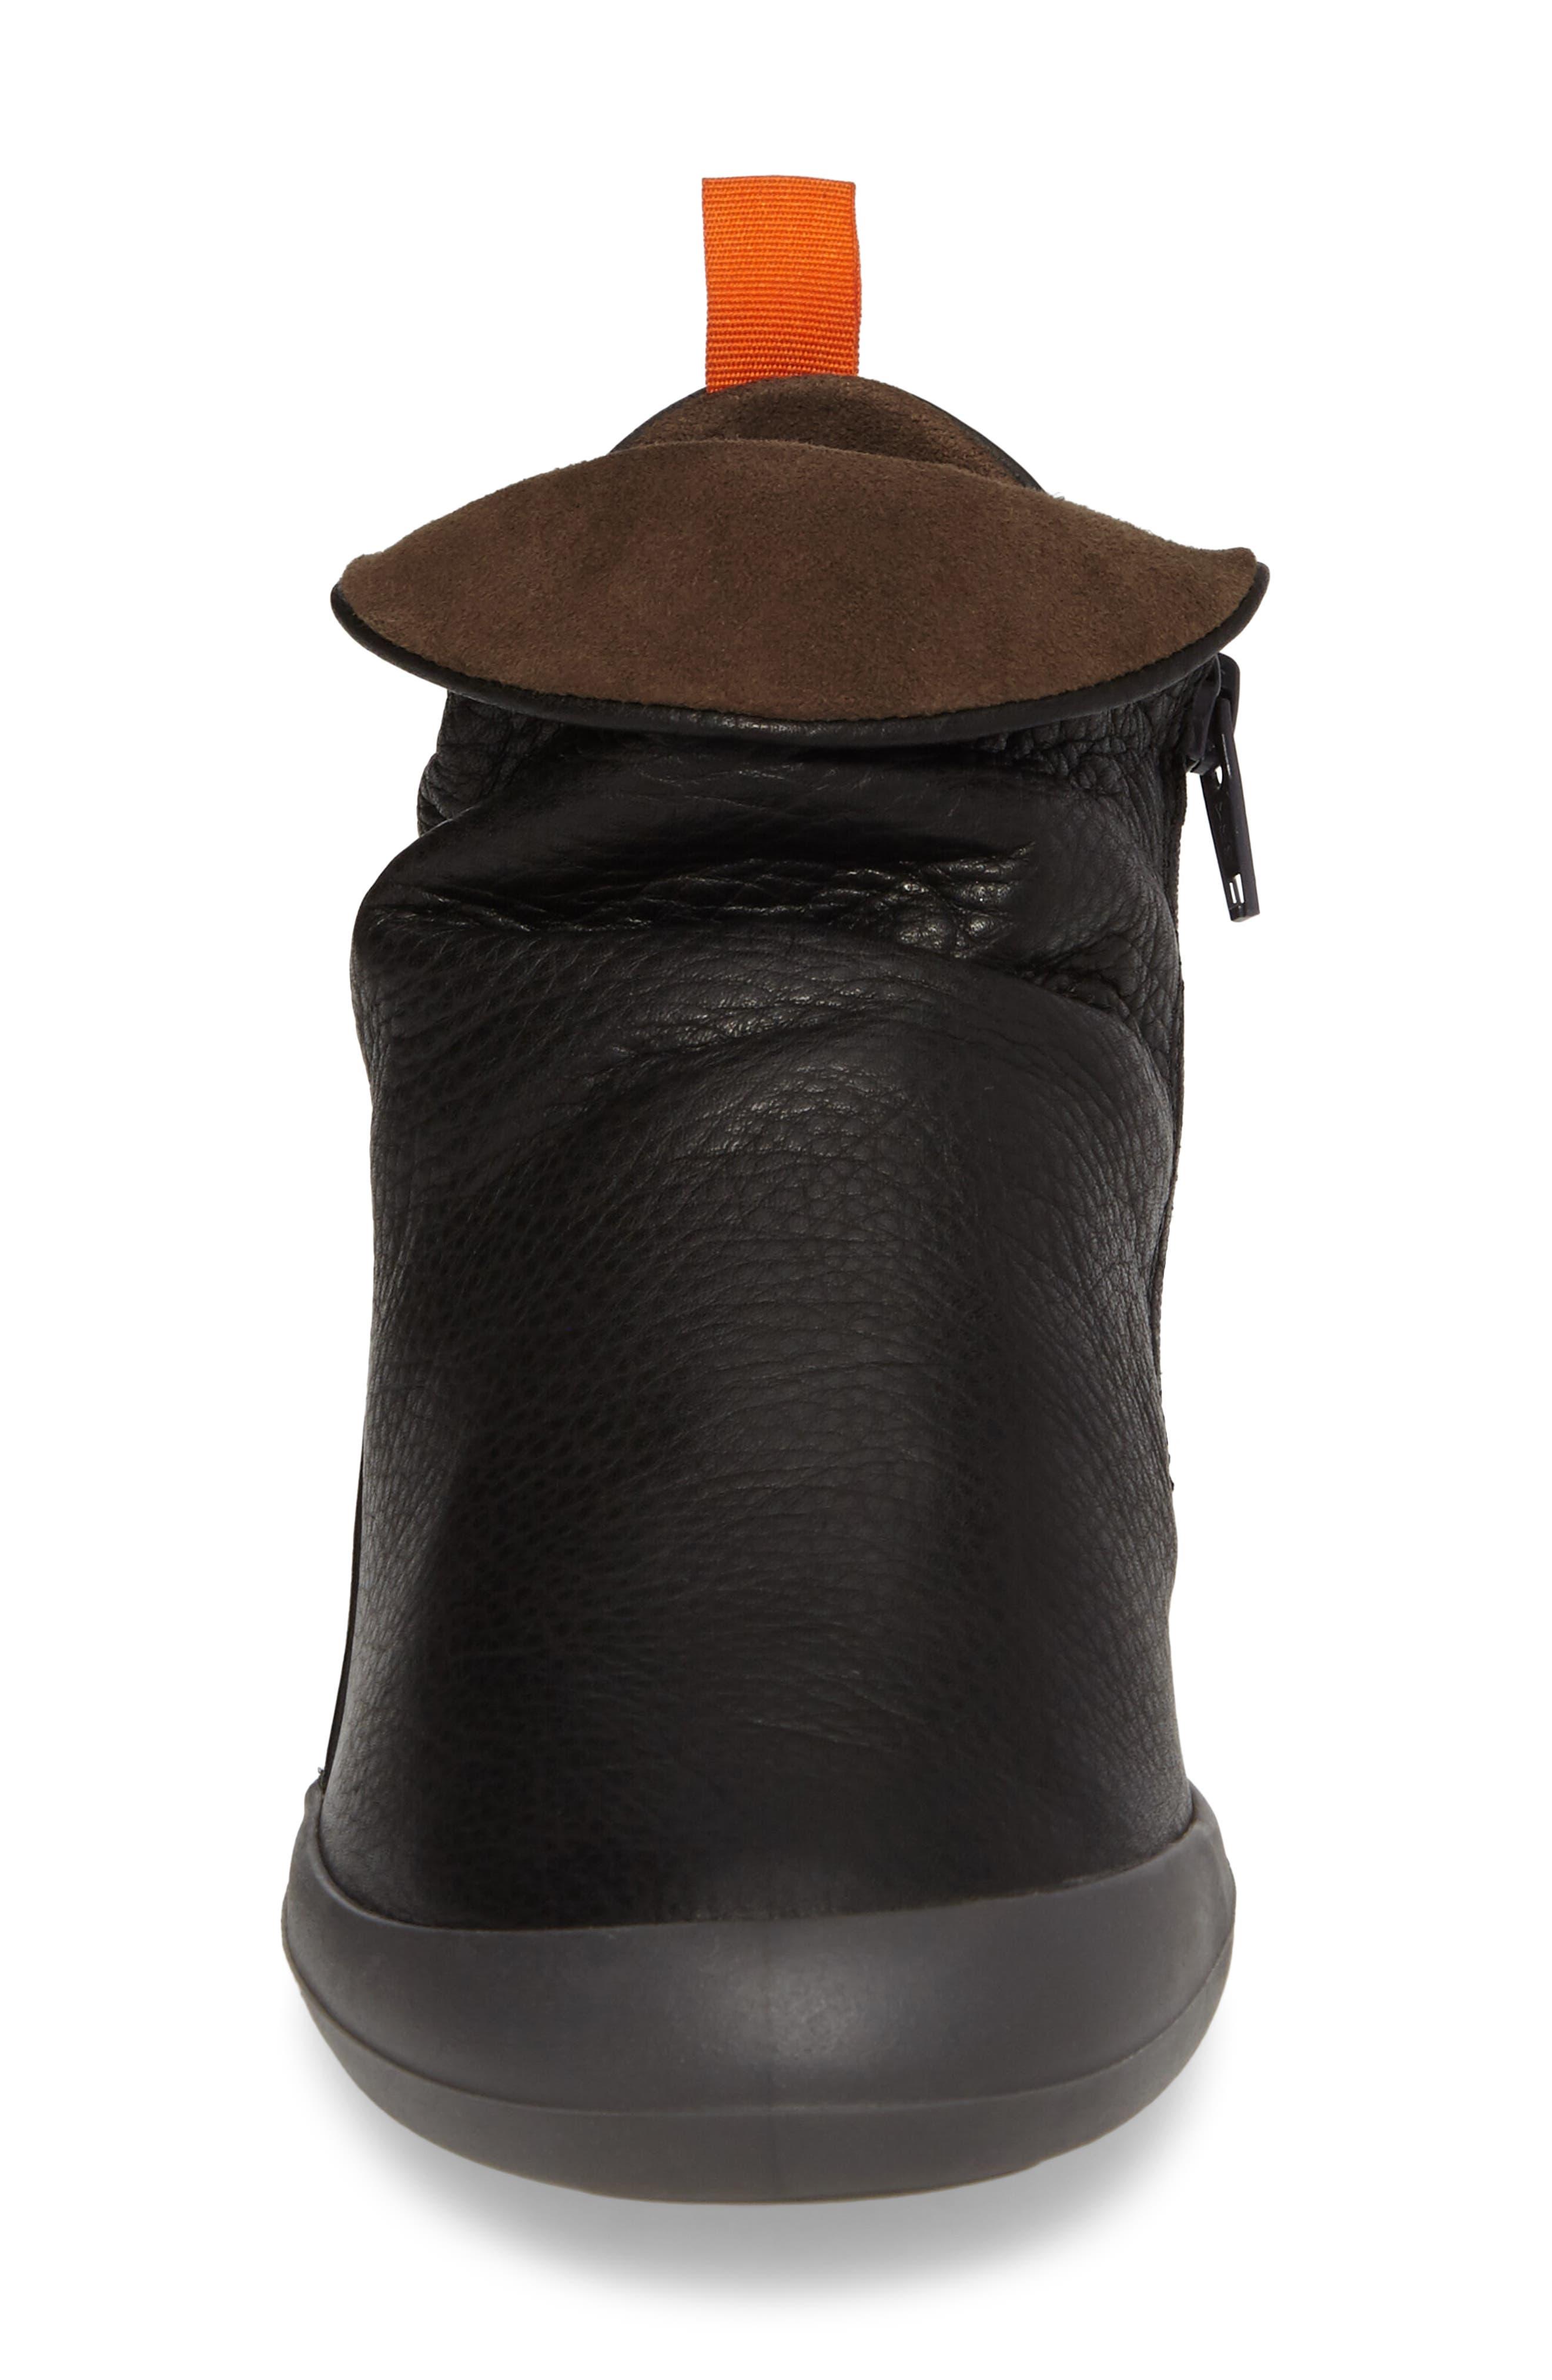 Farah Bootie,                             Alternate thumbnail 4, color,                             Black/ Brown Leather